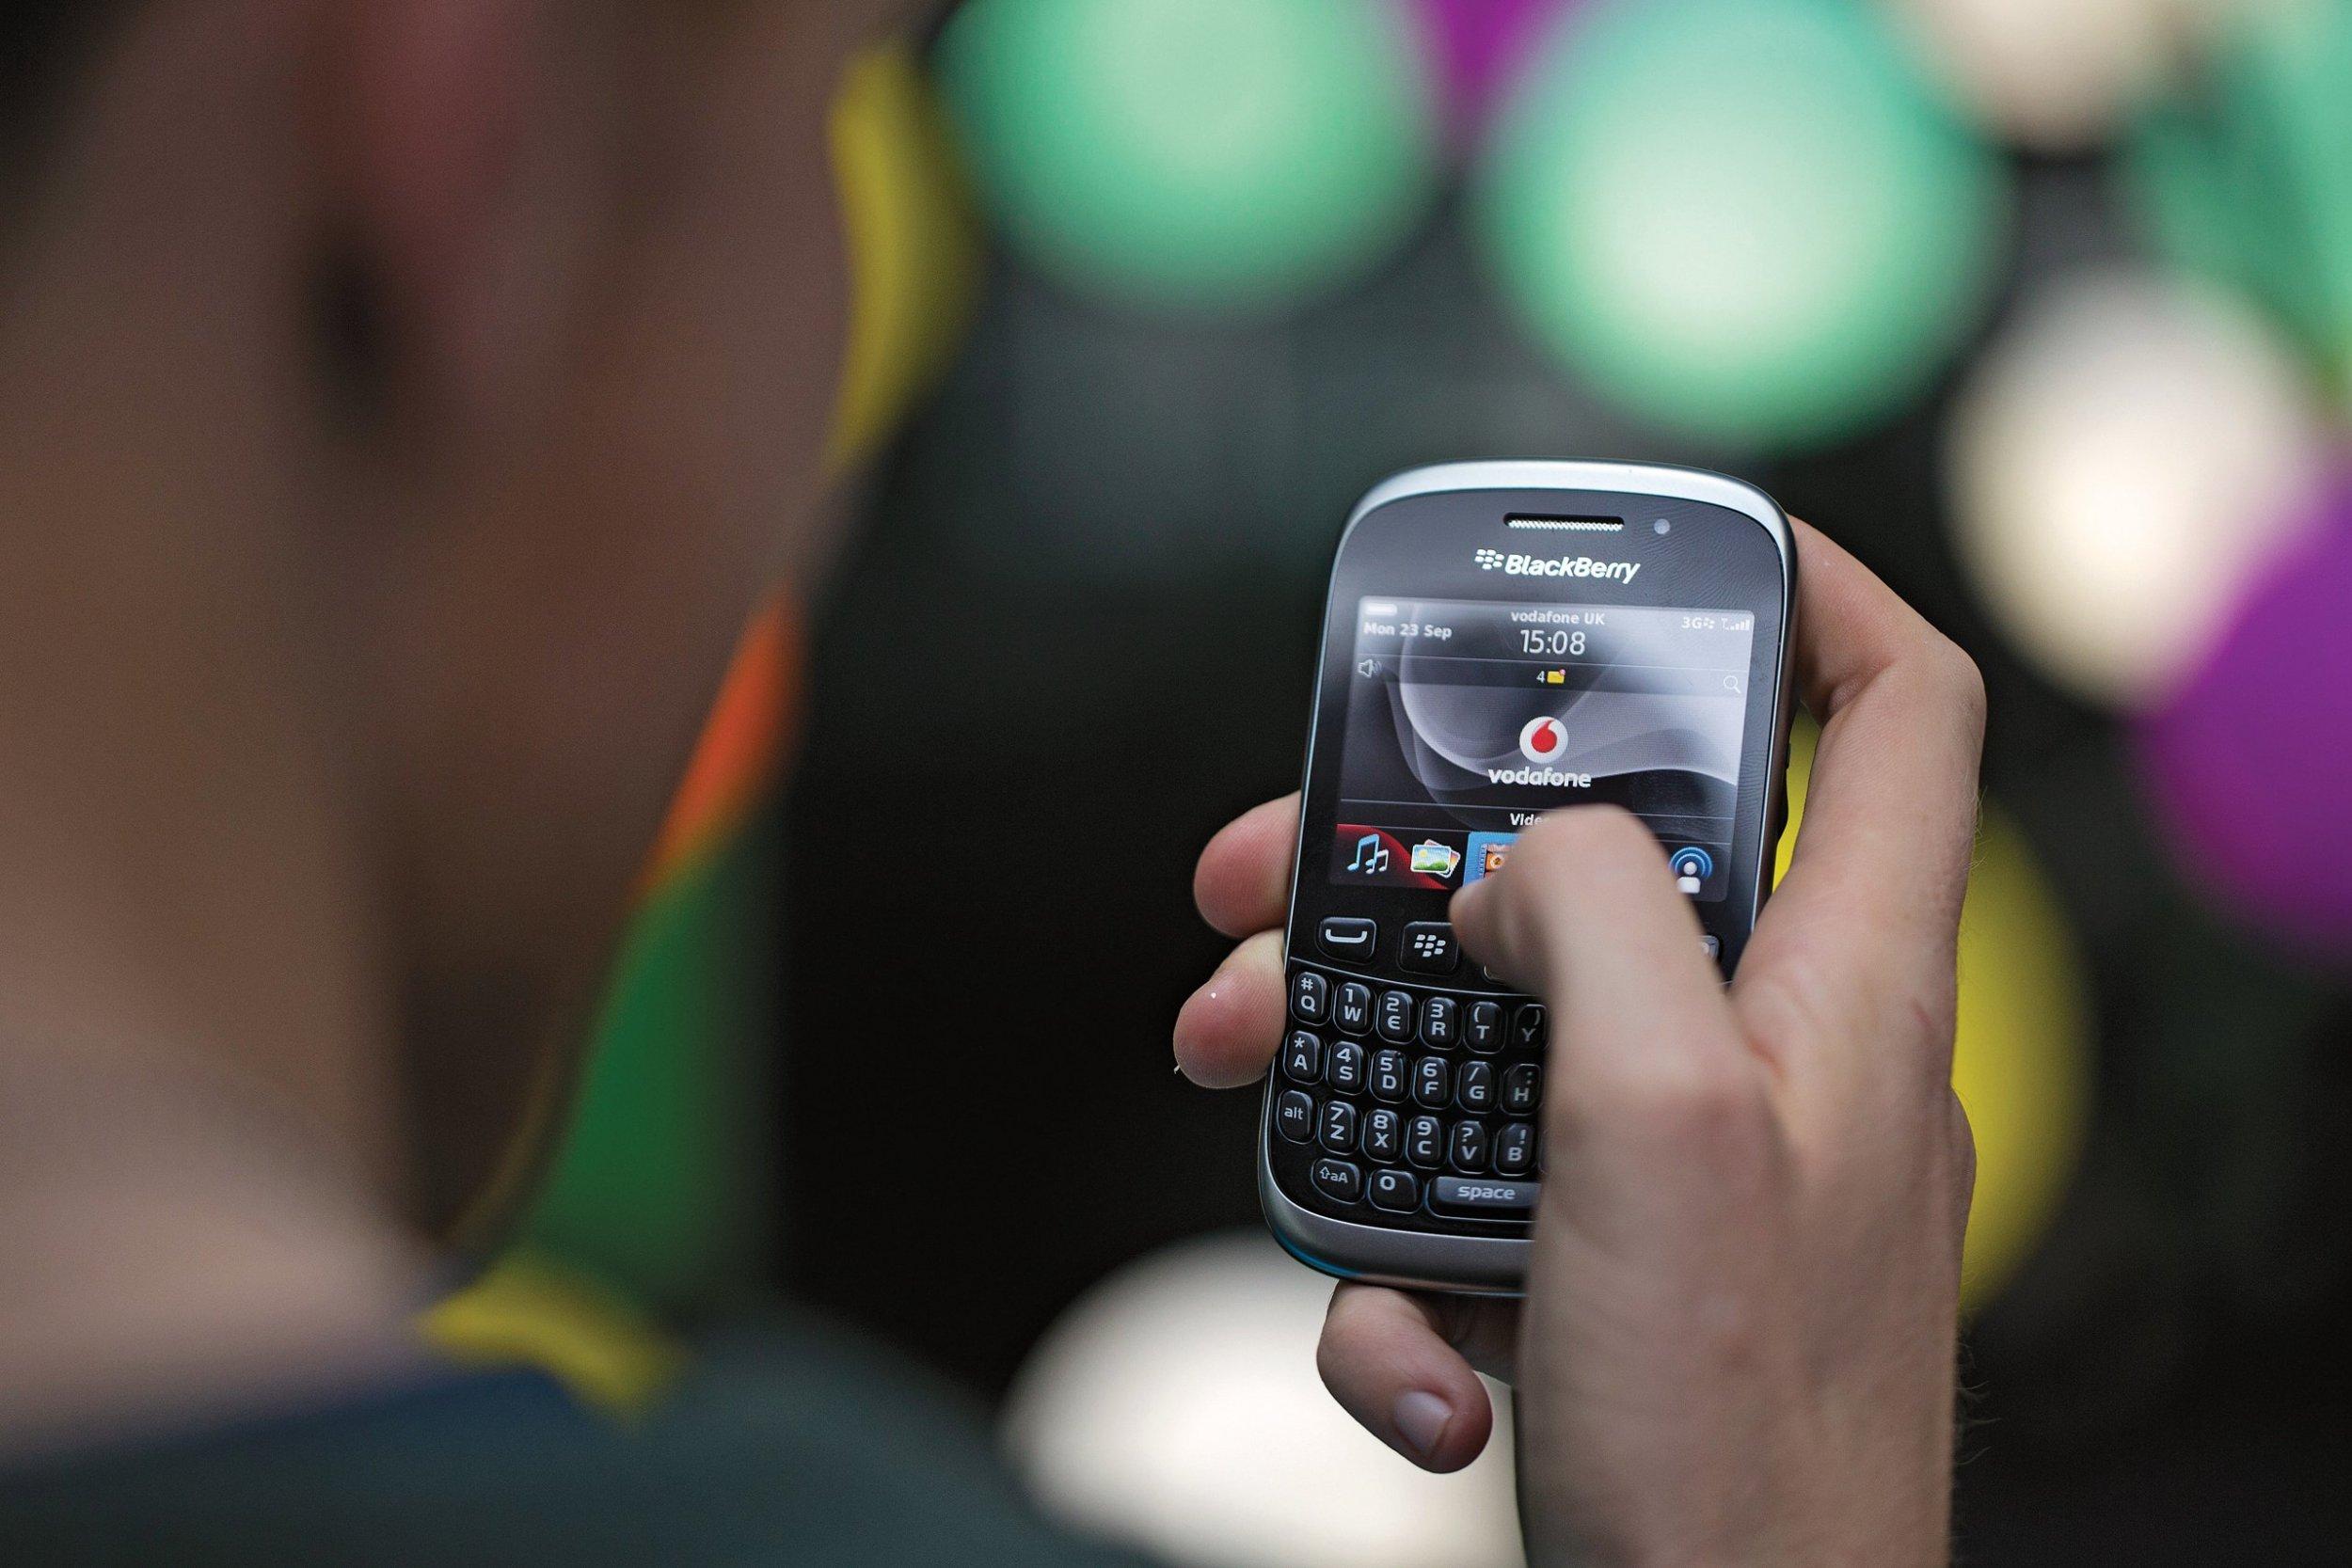 nm-nm0634-blackberry-gross